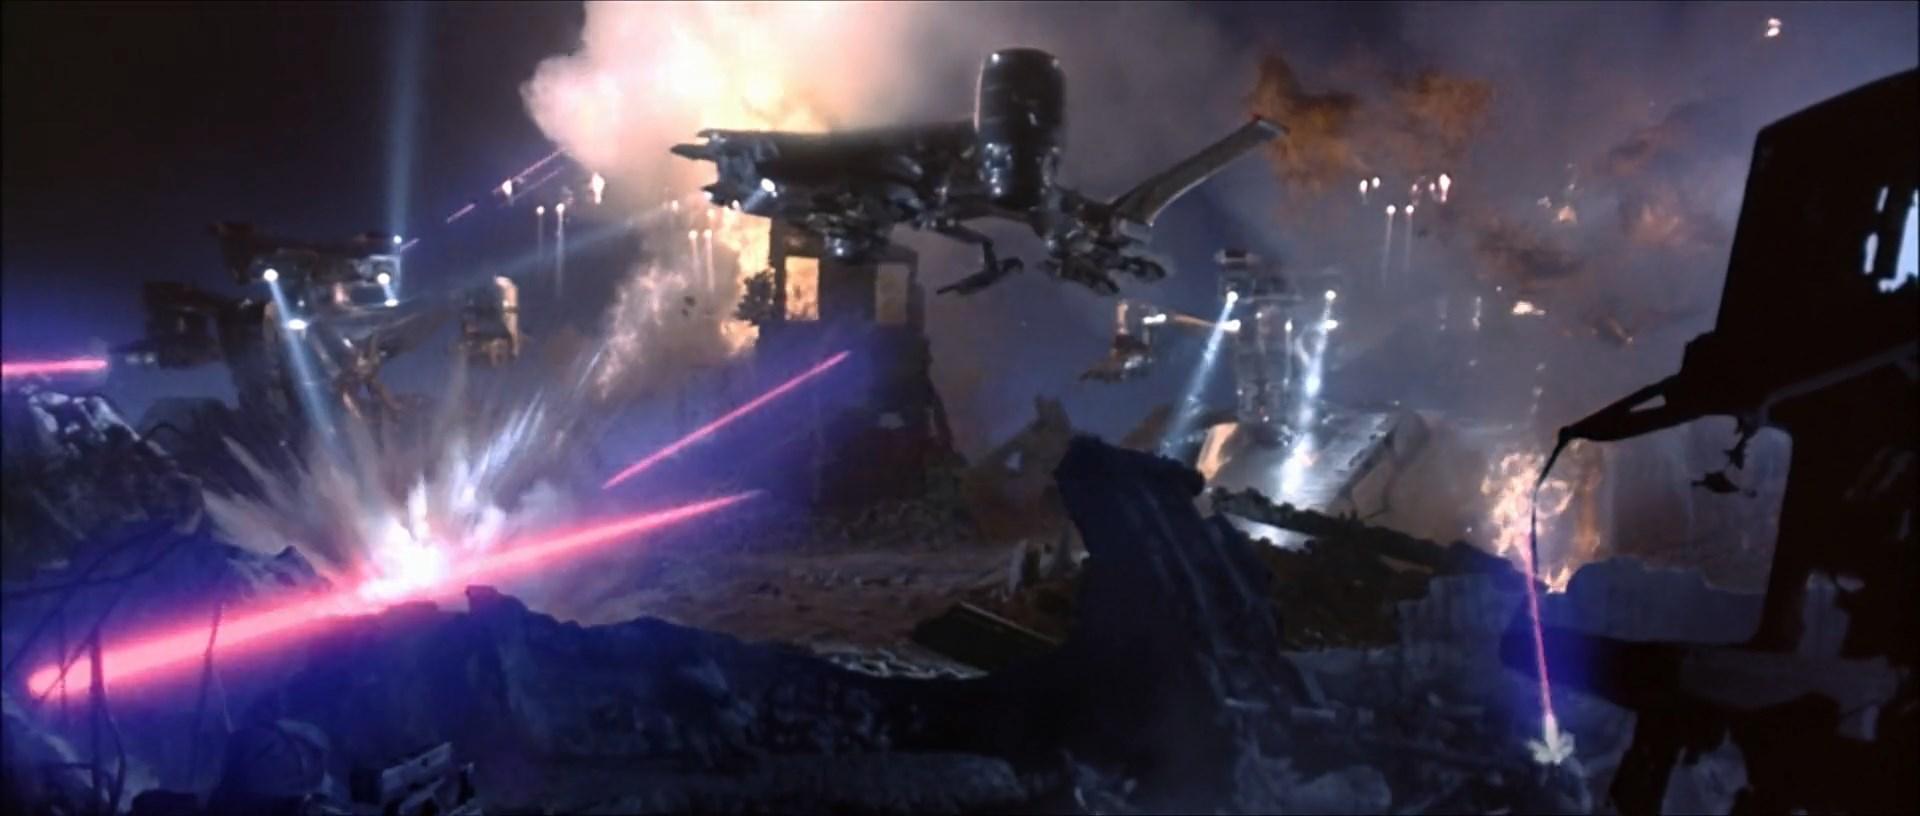 Terminator Machine War The War Against The Machines